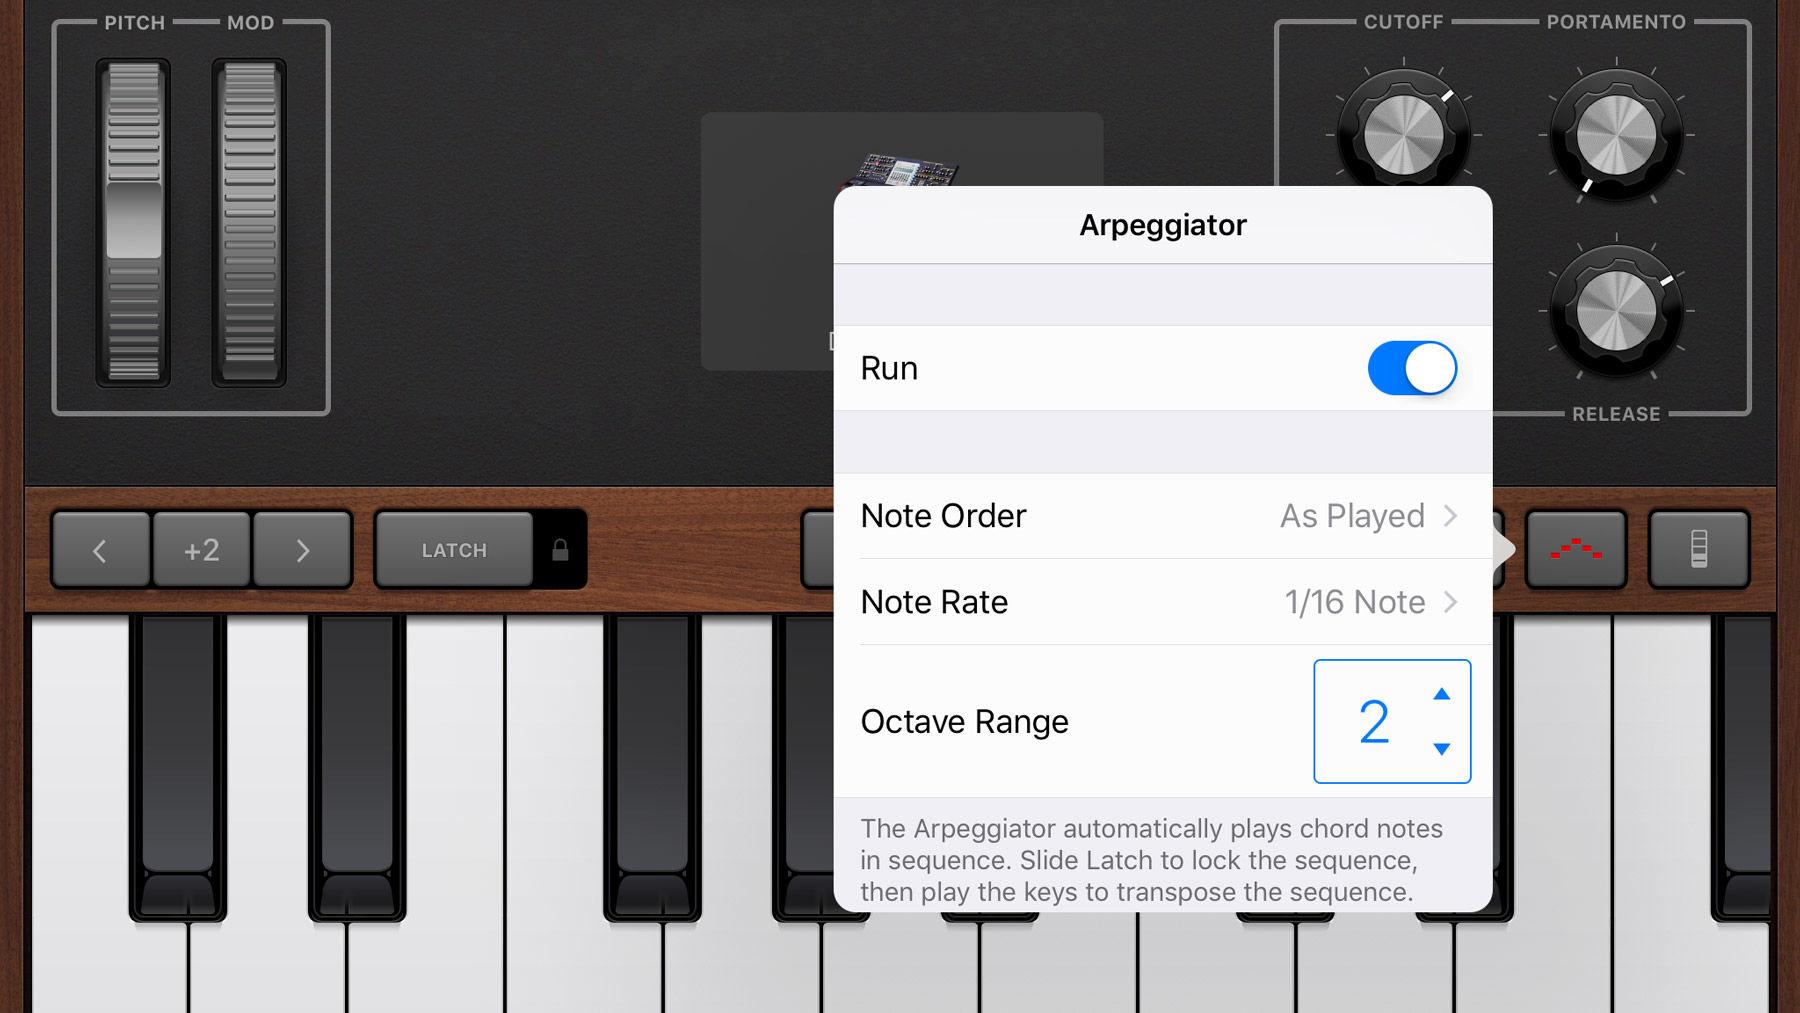 How to use GarageBand on iPhone and iPad: Arpeggiator